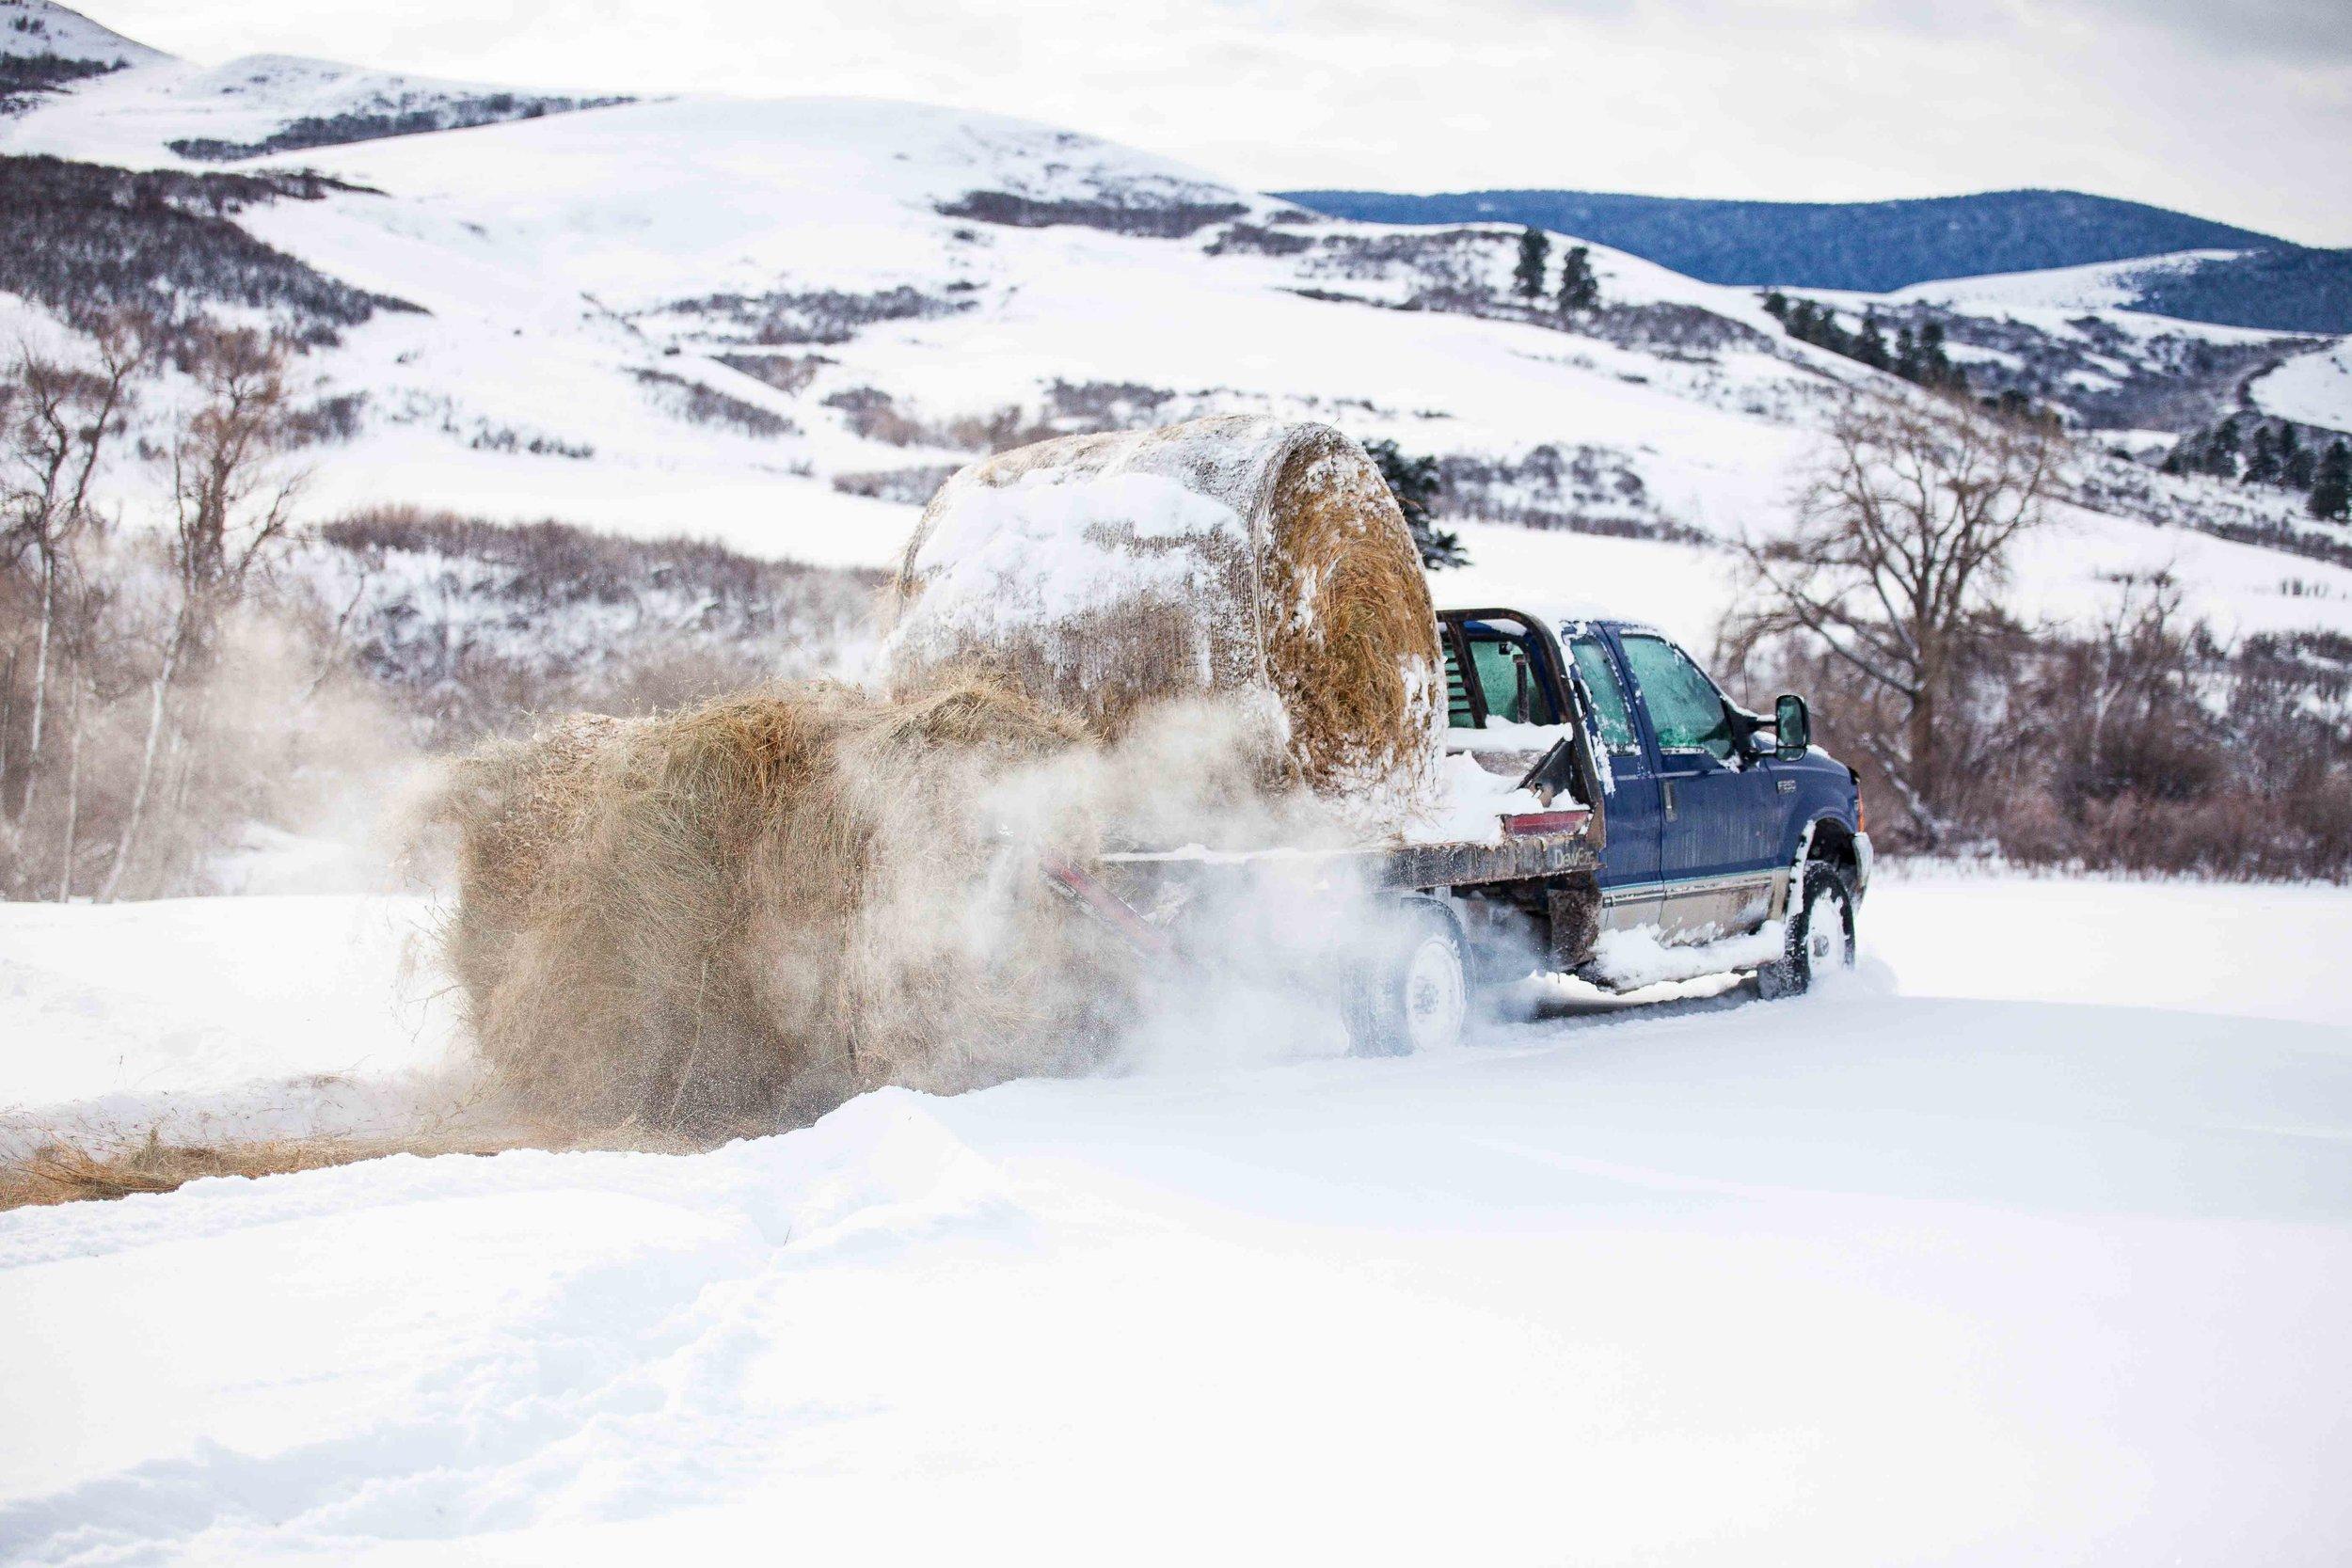 Lower hydrolic arms and unroll hay